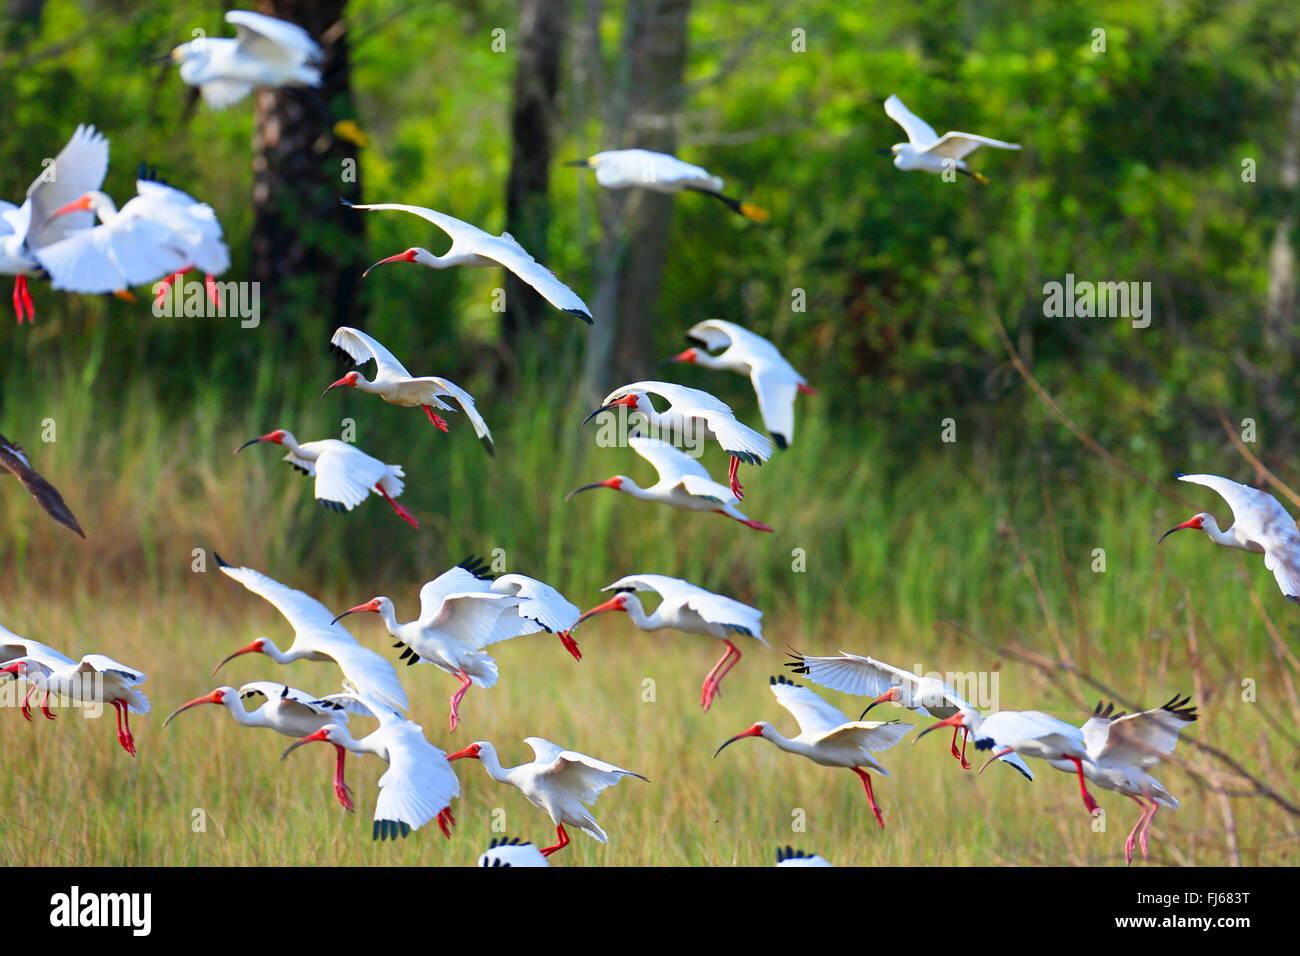 Ibis blanc (Eudocimus albus), troupes de débarquement, USA, Floride, Merritt Island Banque D'Images